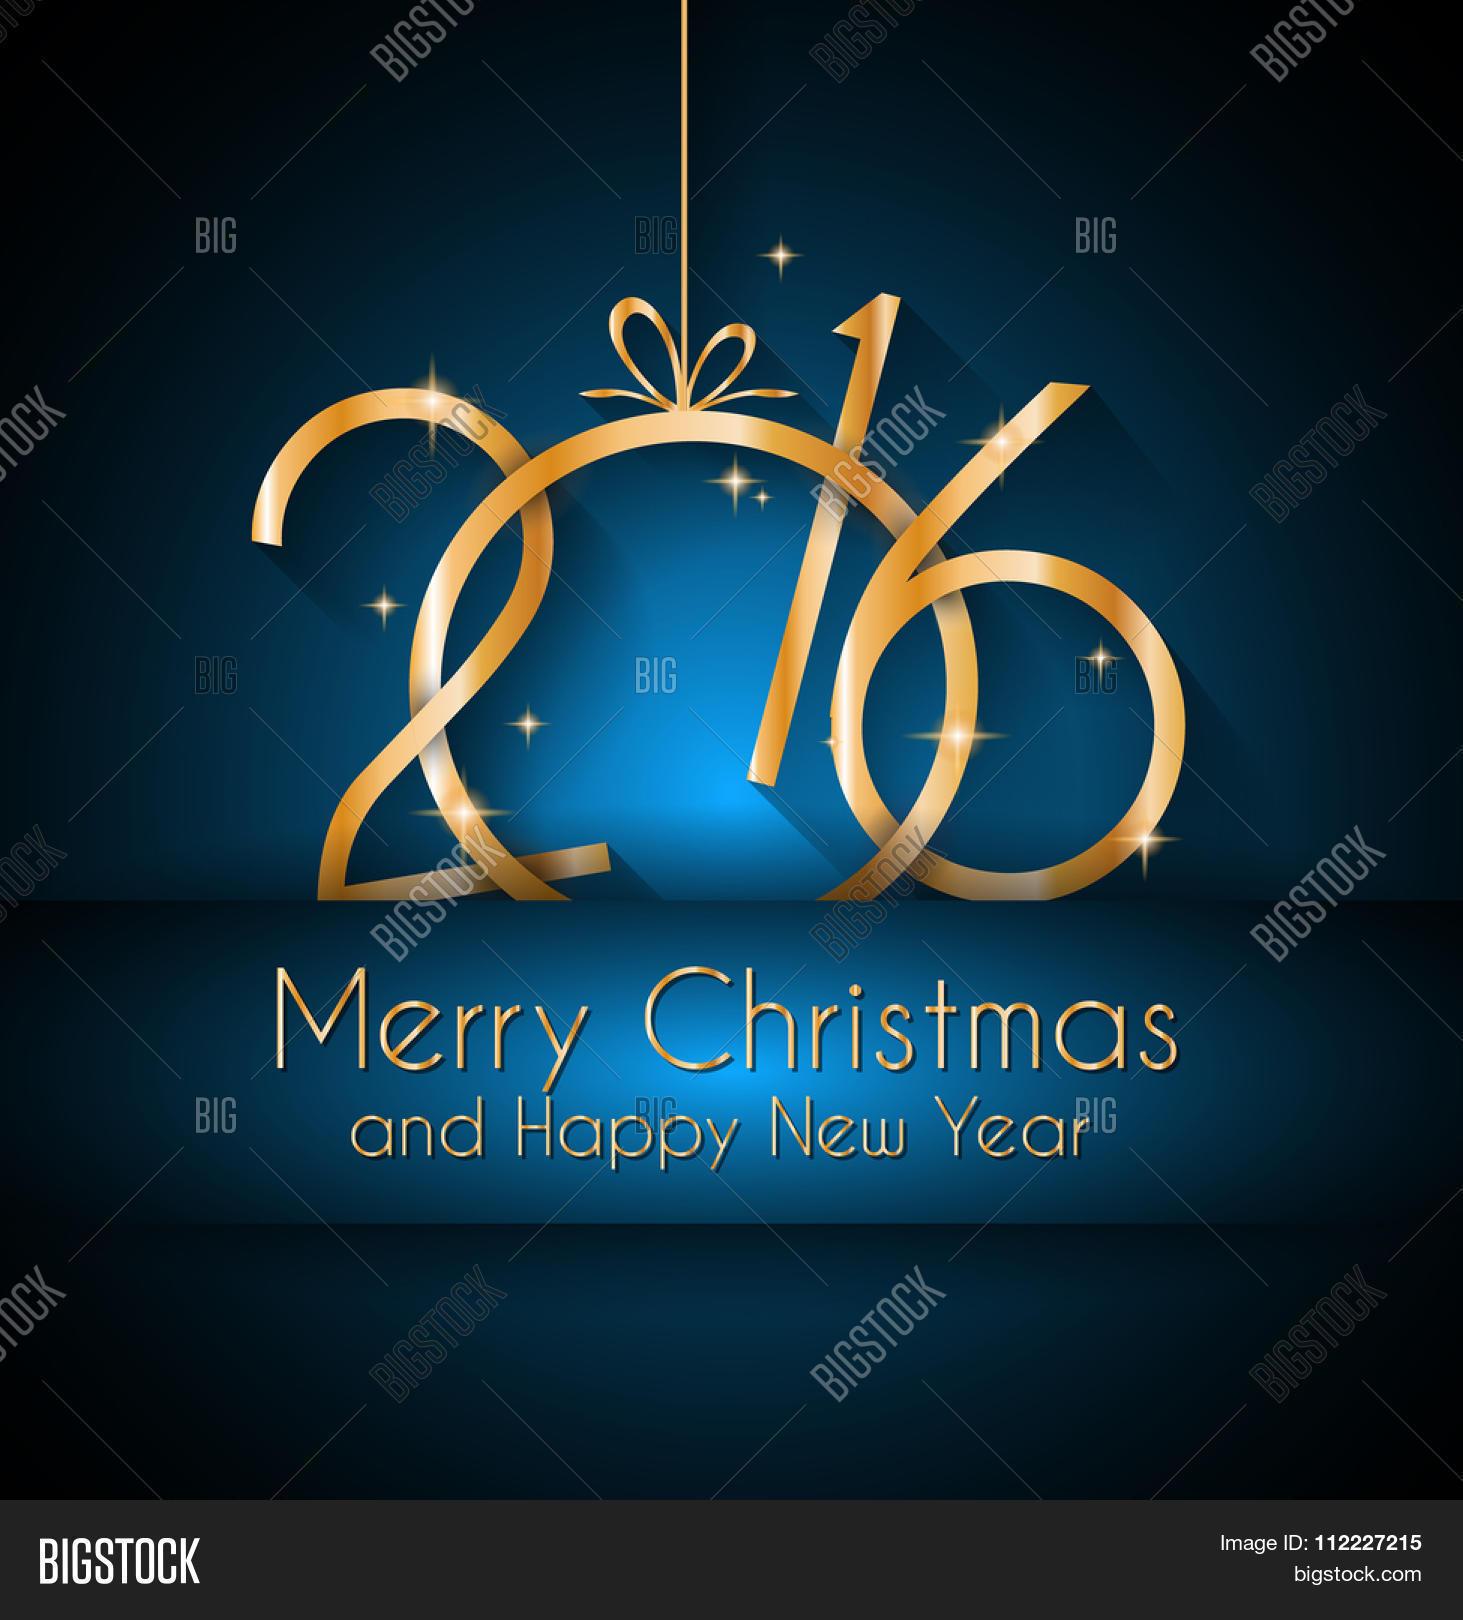 2016 Happy New Year Vector Photo Free Trial Bigstock